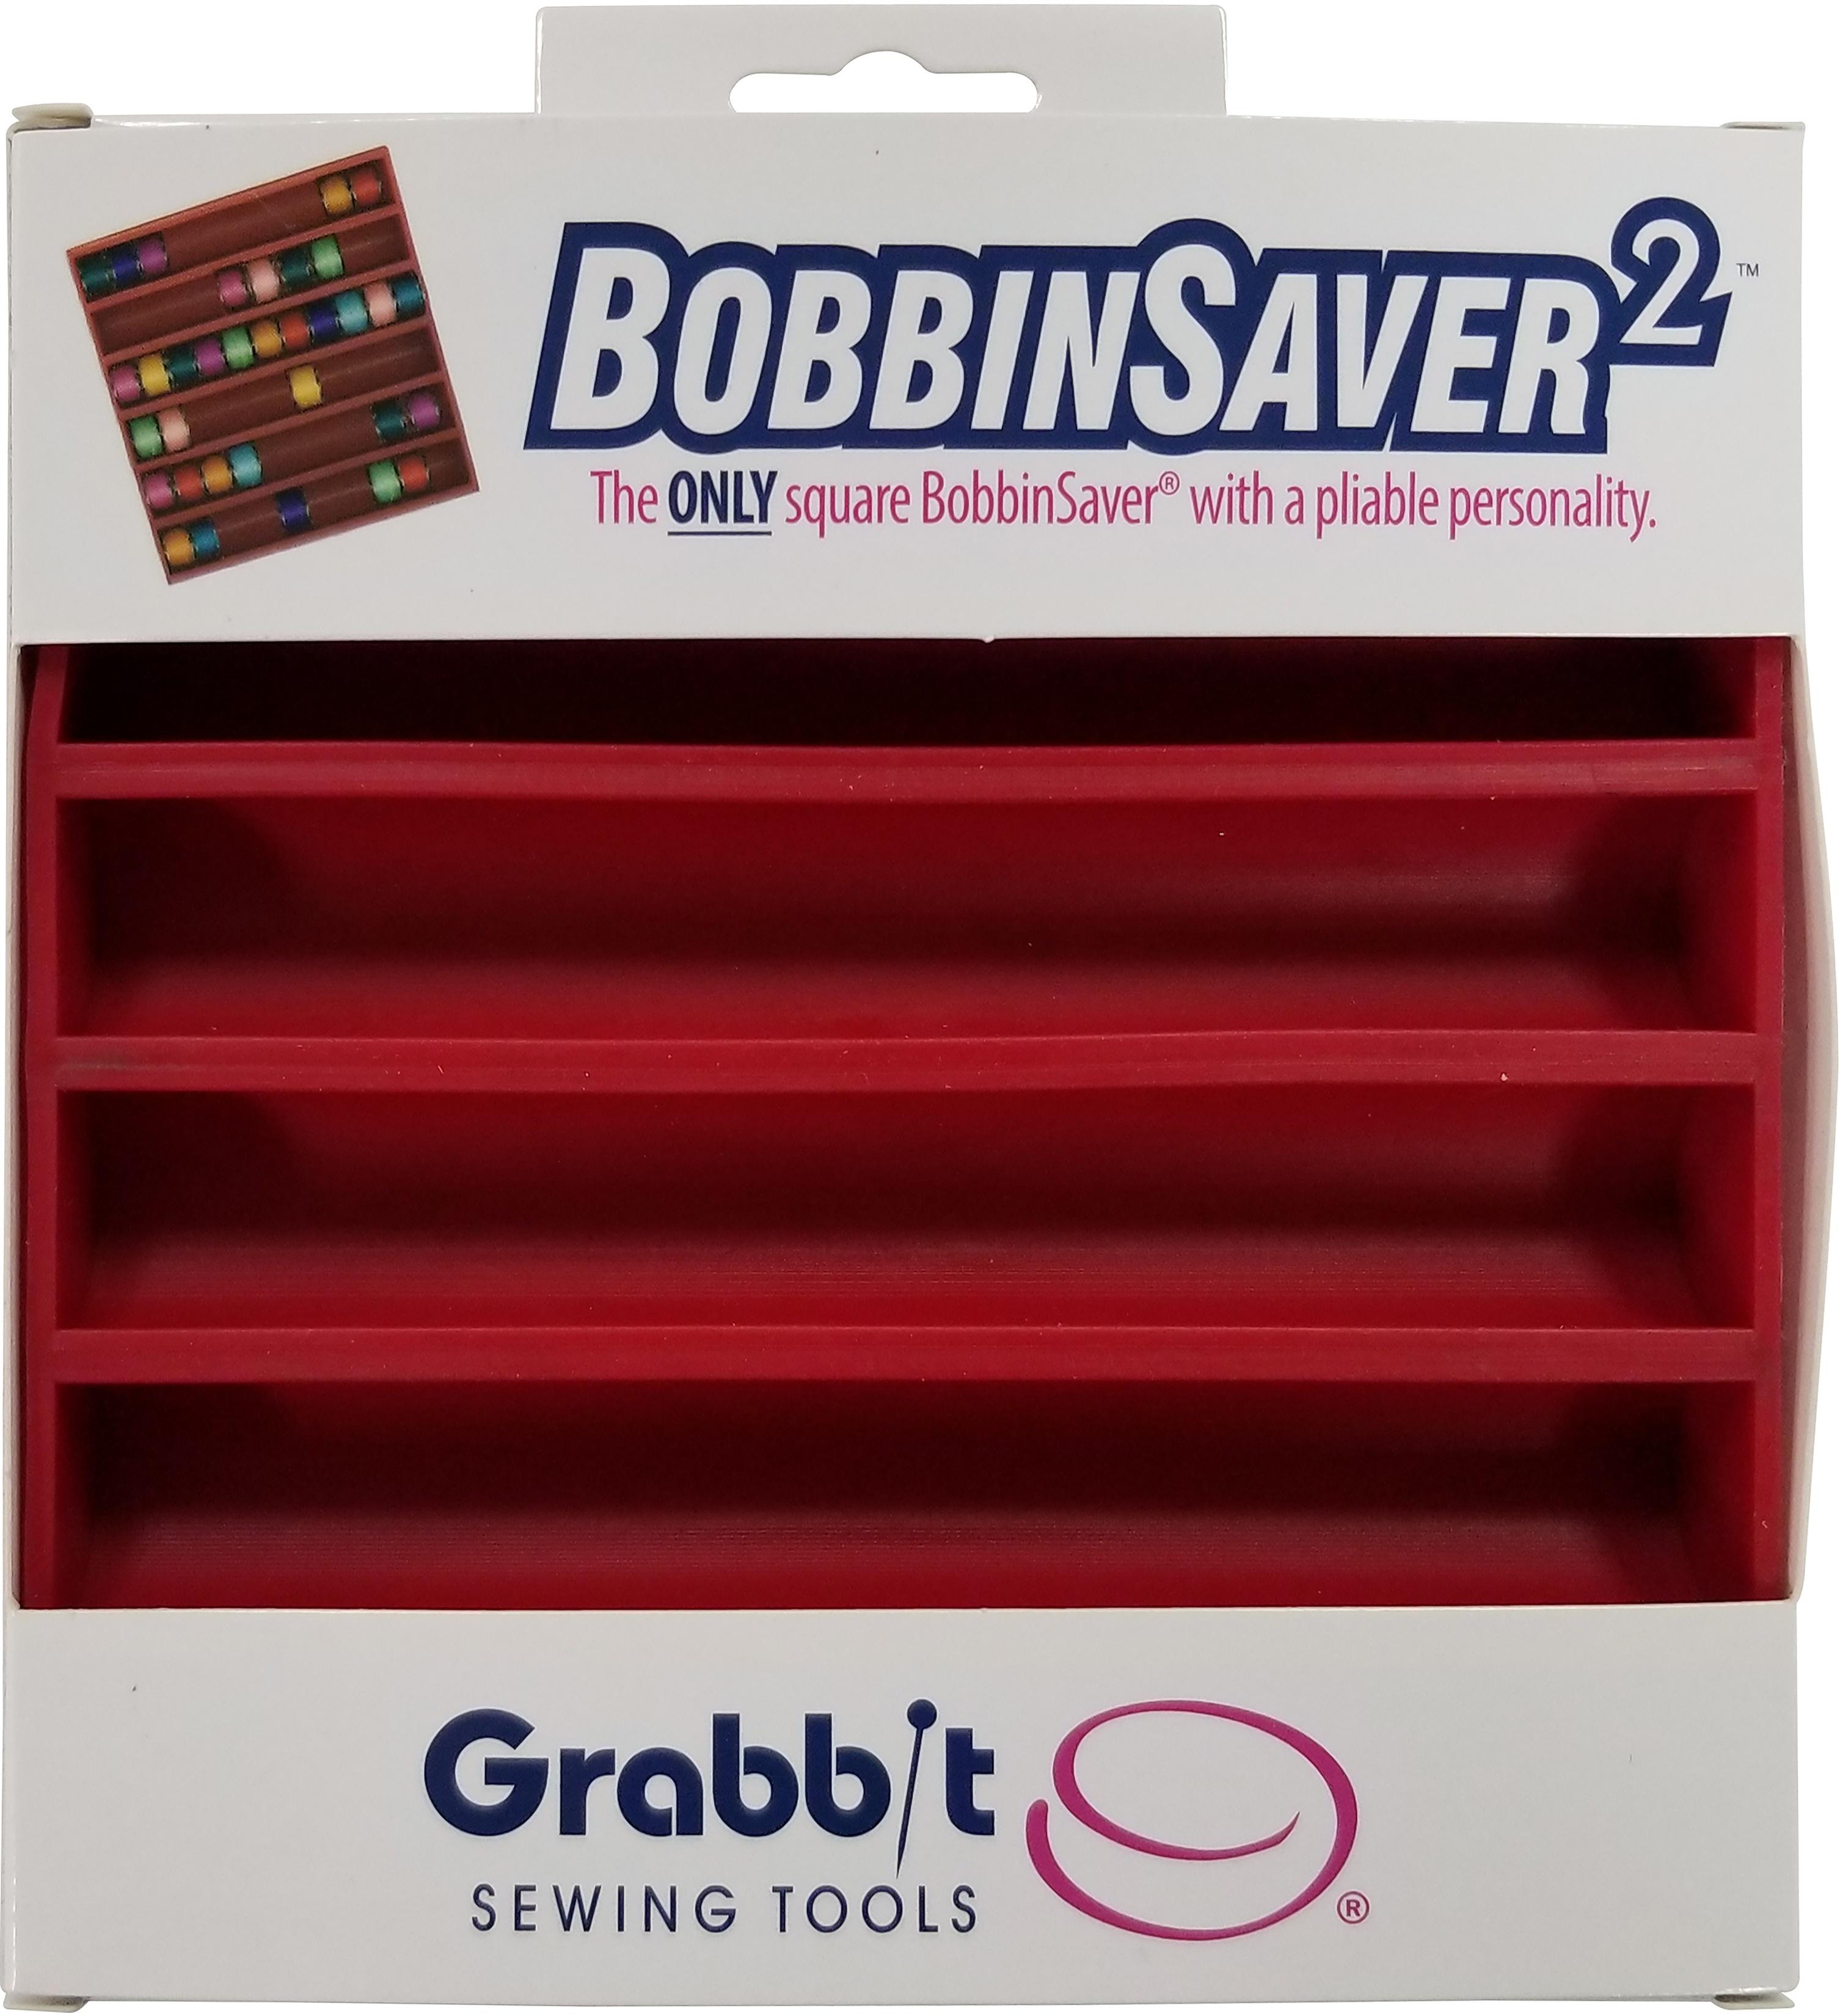 Grabbit BobbinSaver 2-Red, Holds Up To 66 Bobbins